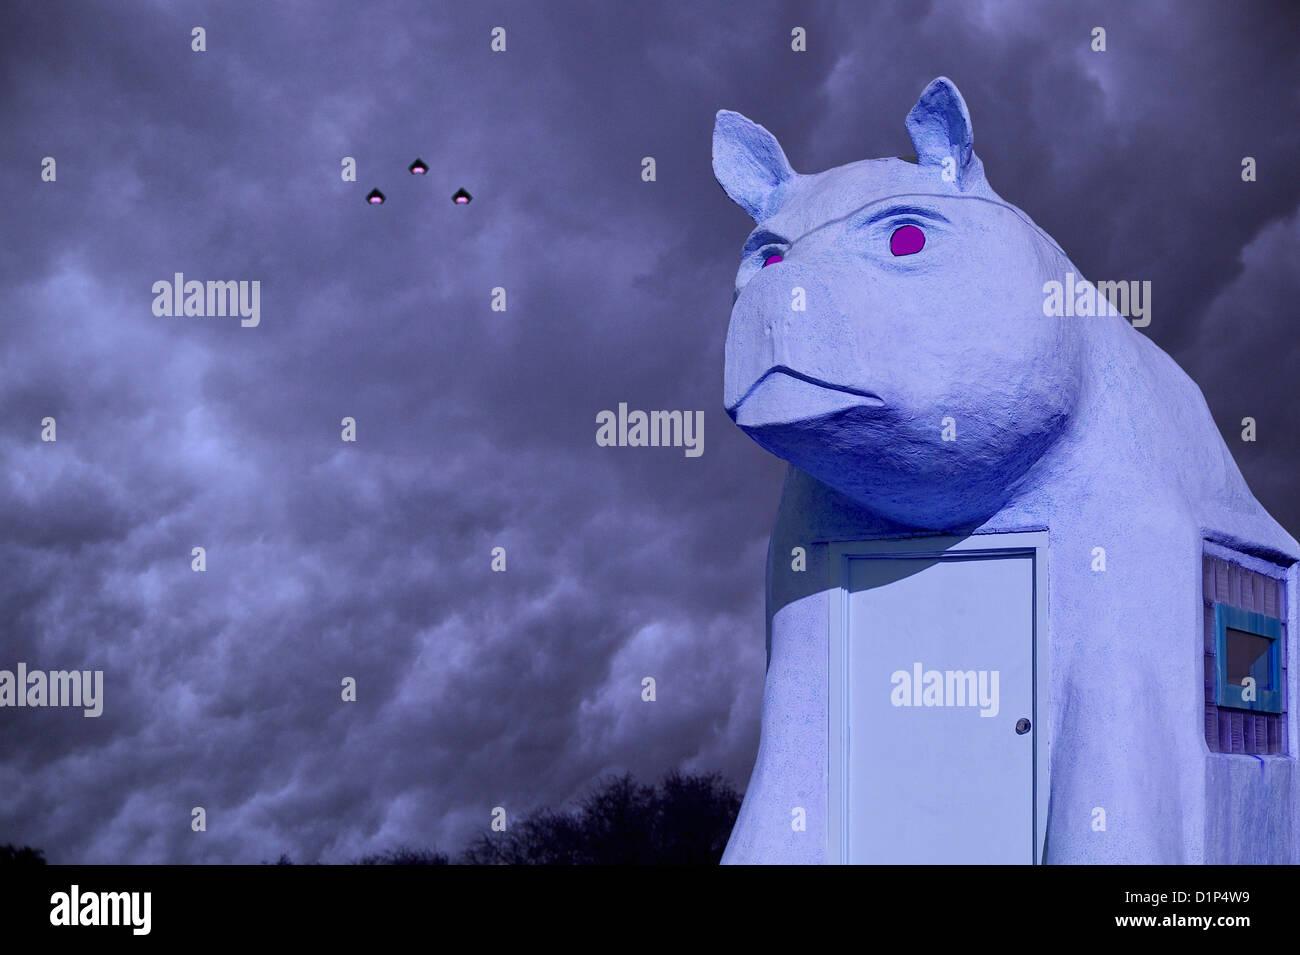 Do purple pigs fly? - Stock Image